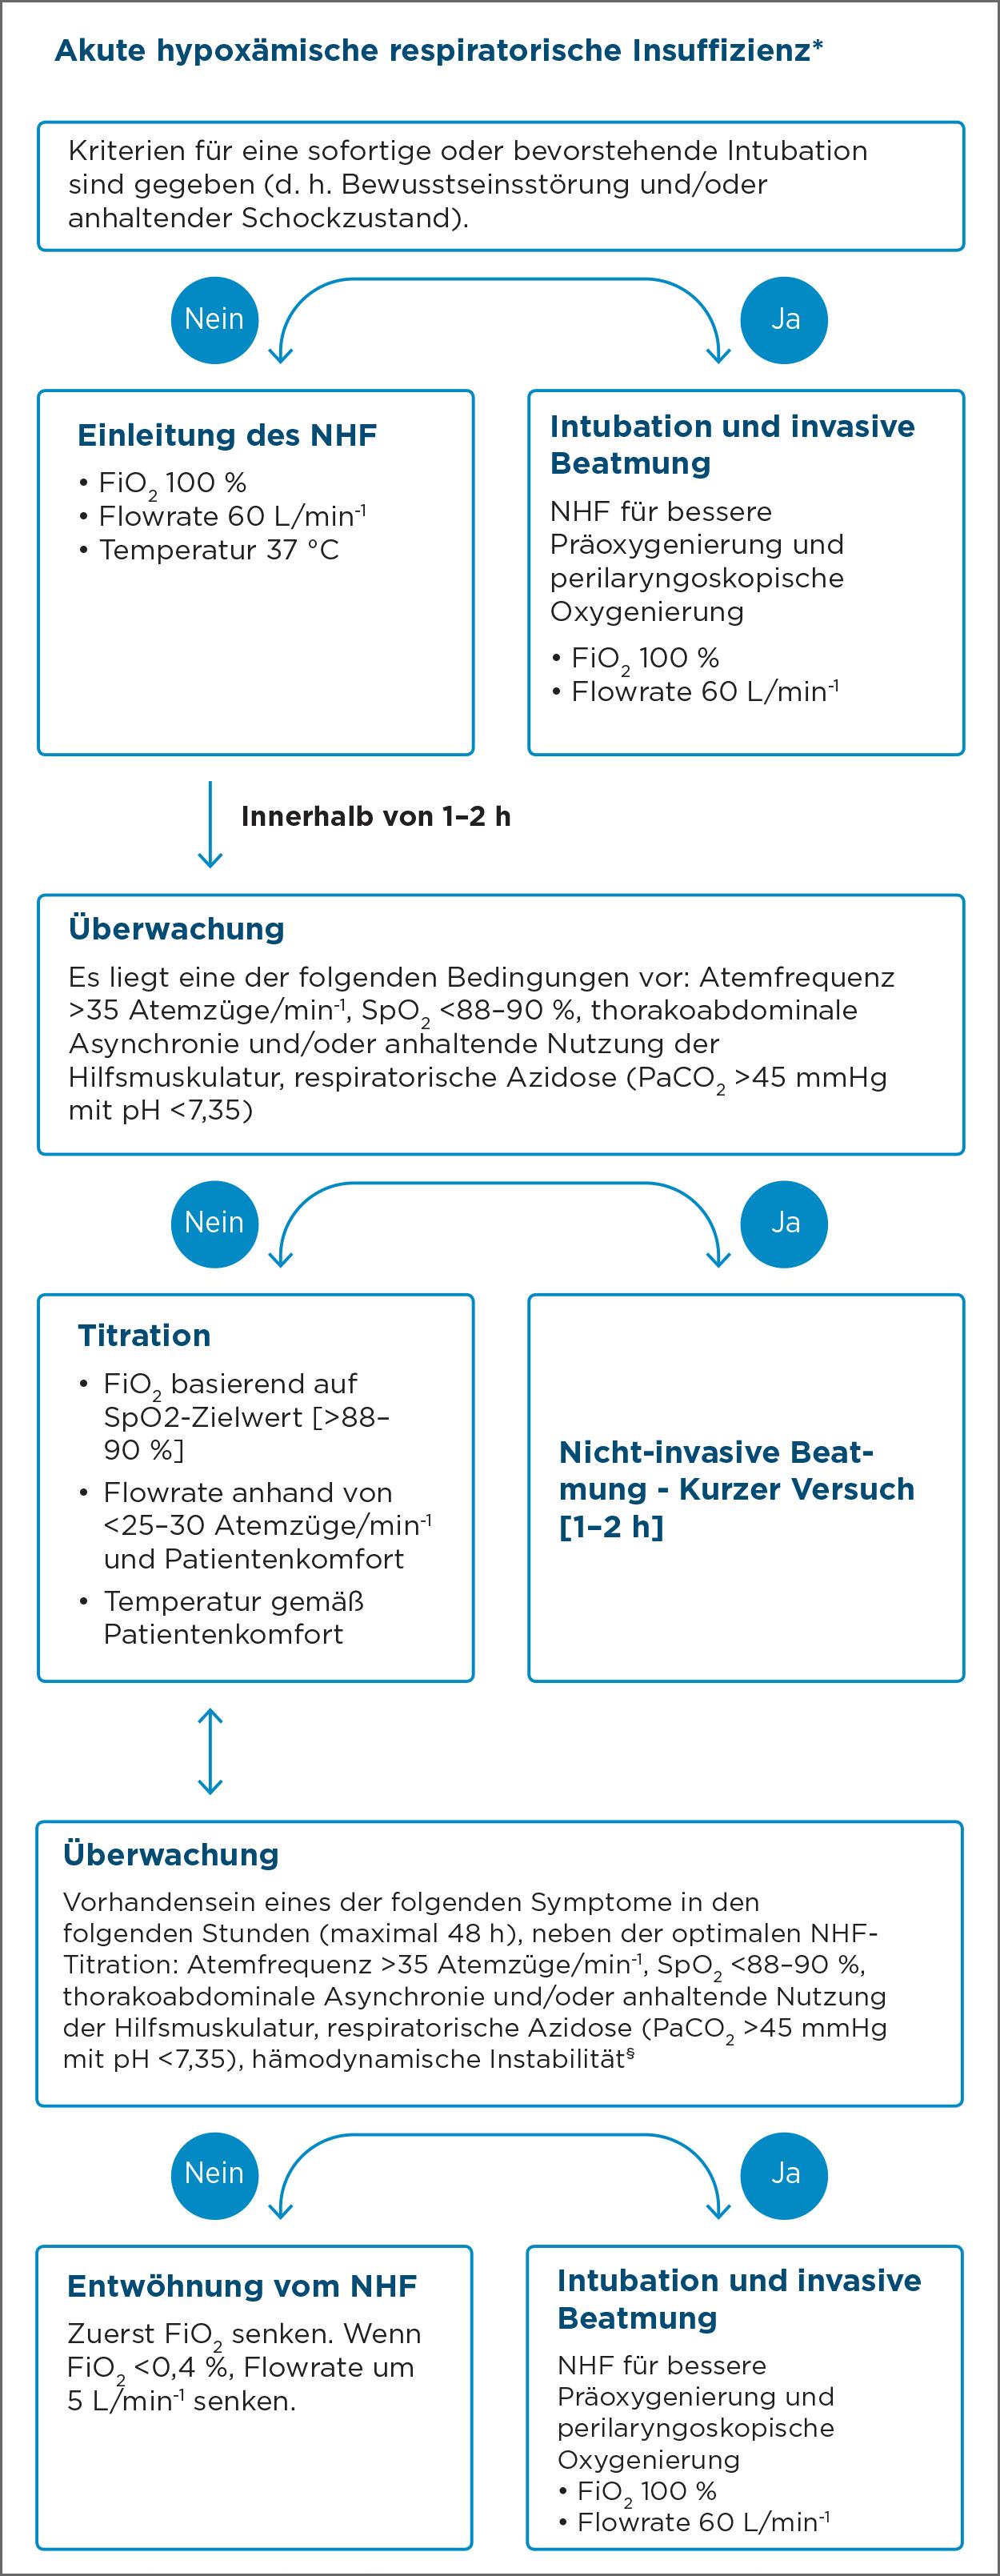 Ischaki 2017 European Respiratory Review